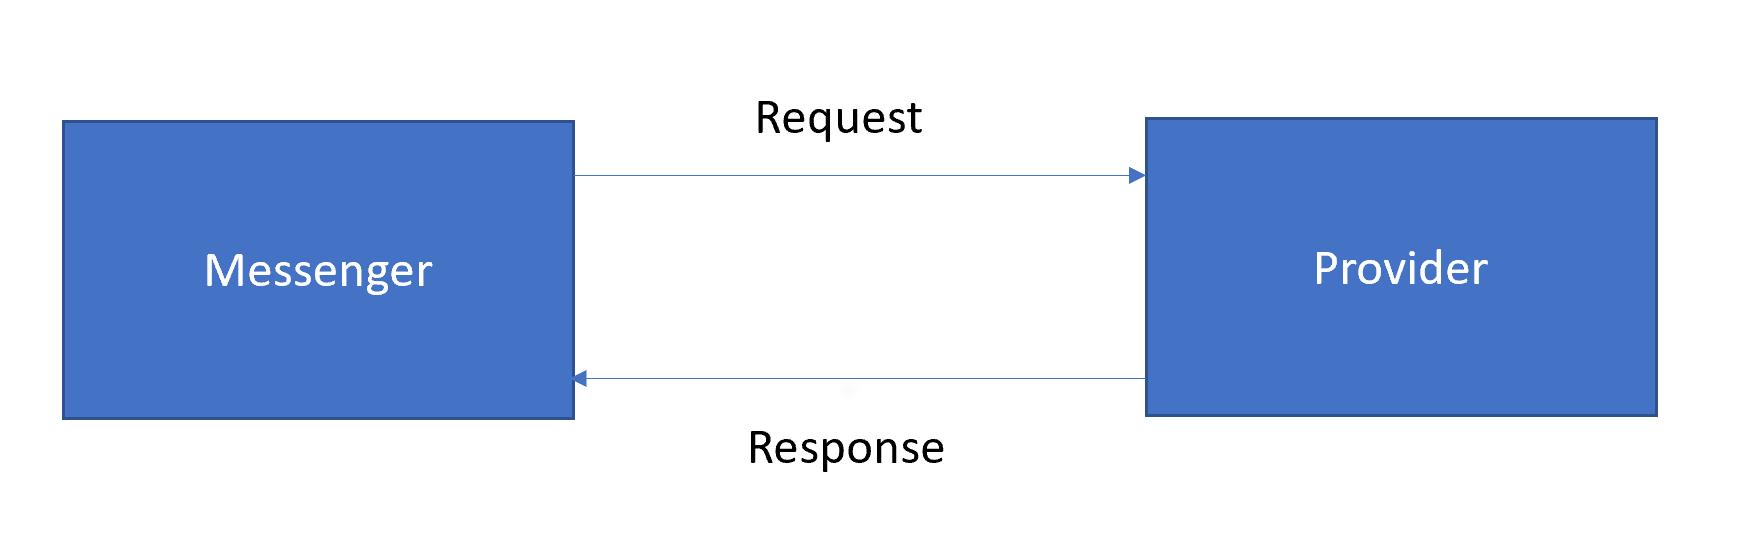 Performance Framework Image